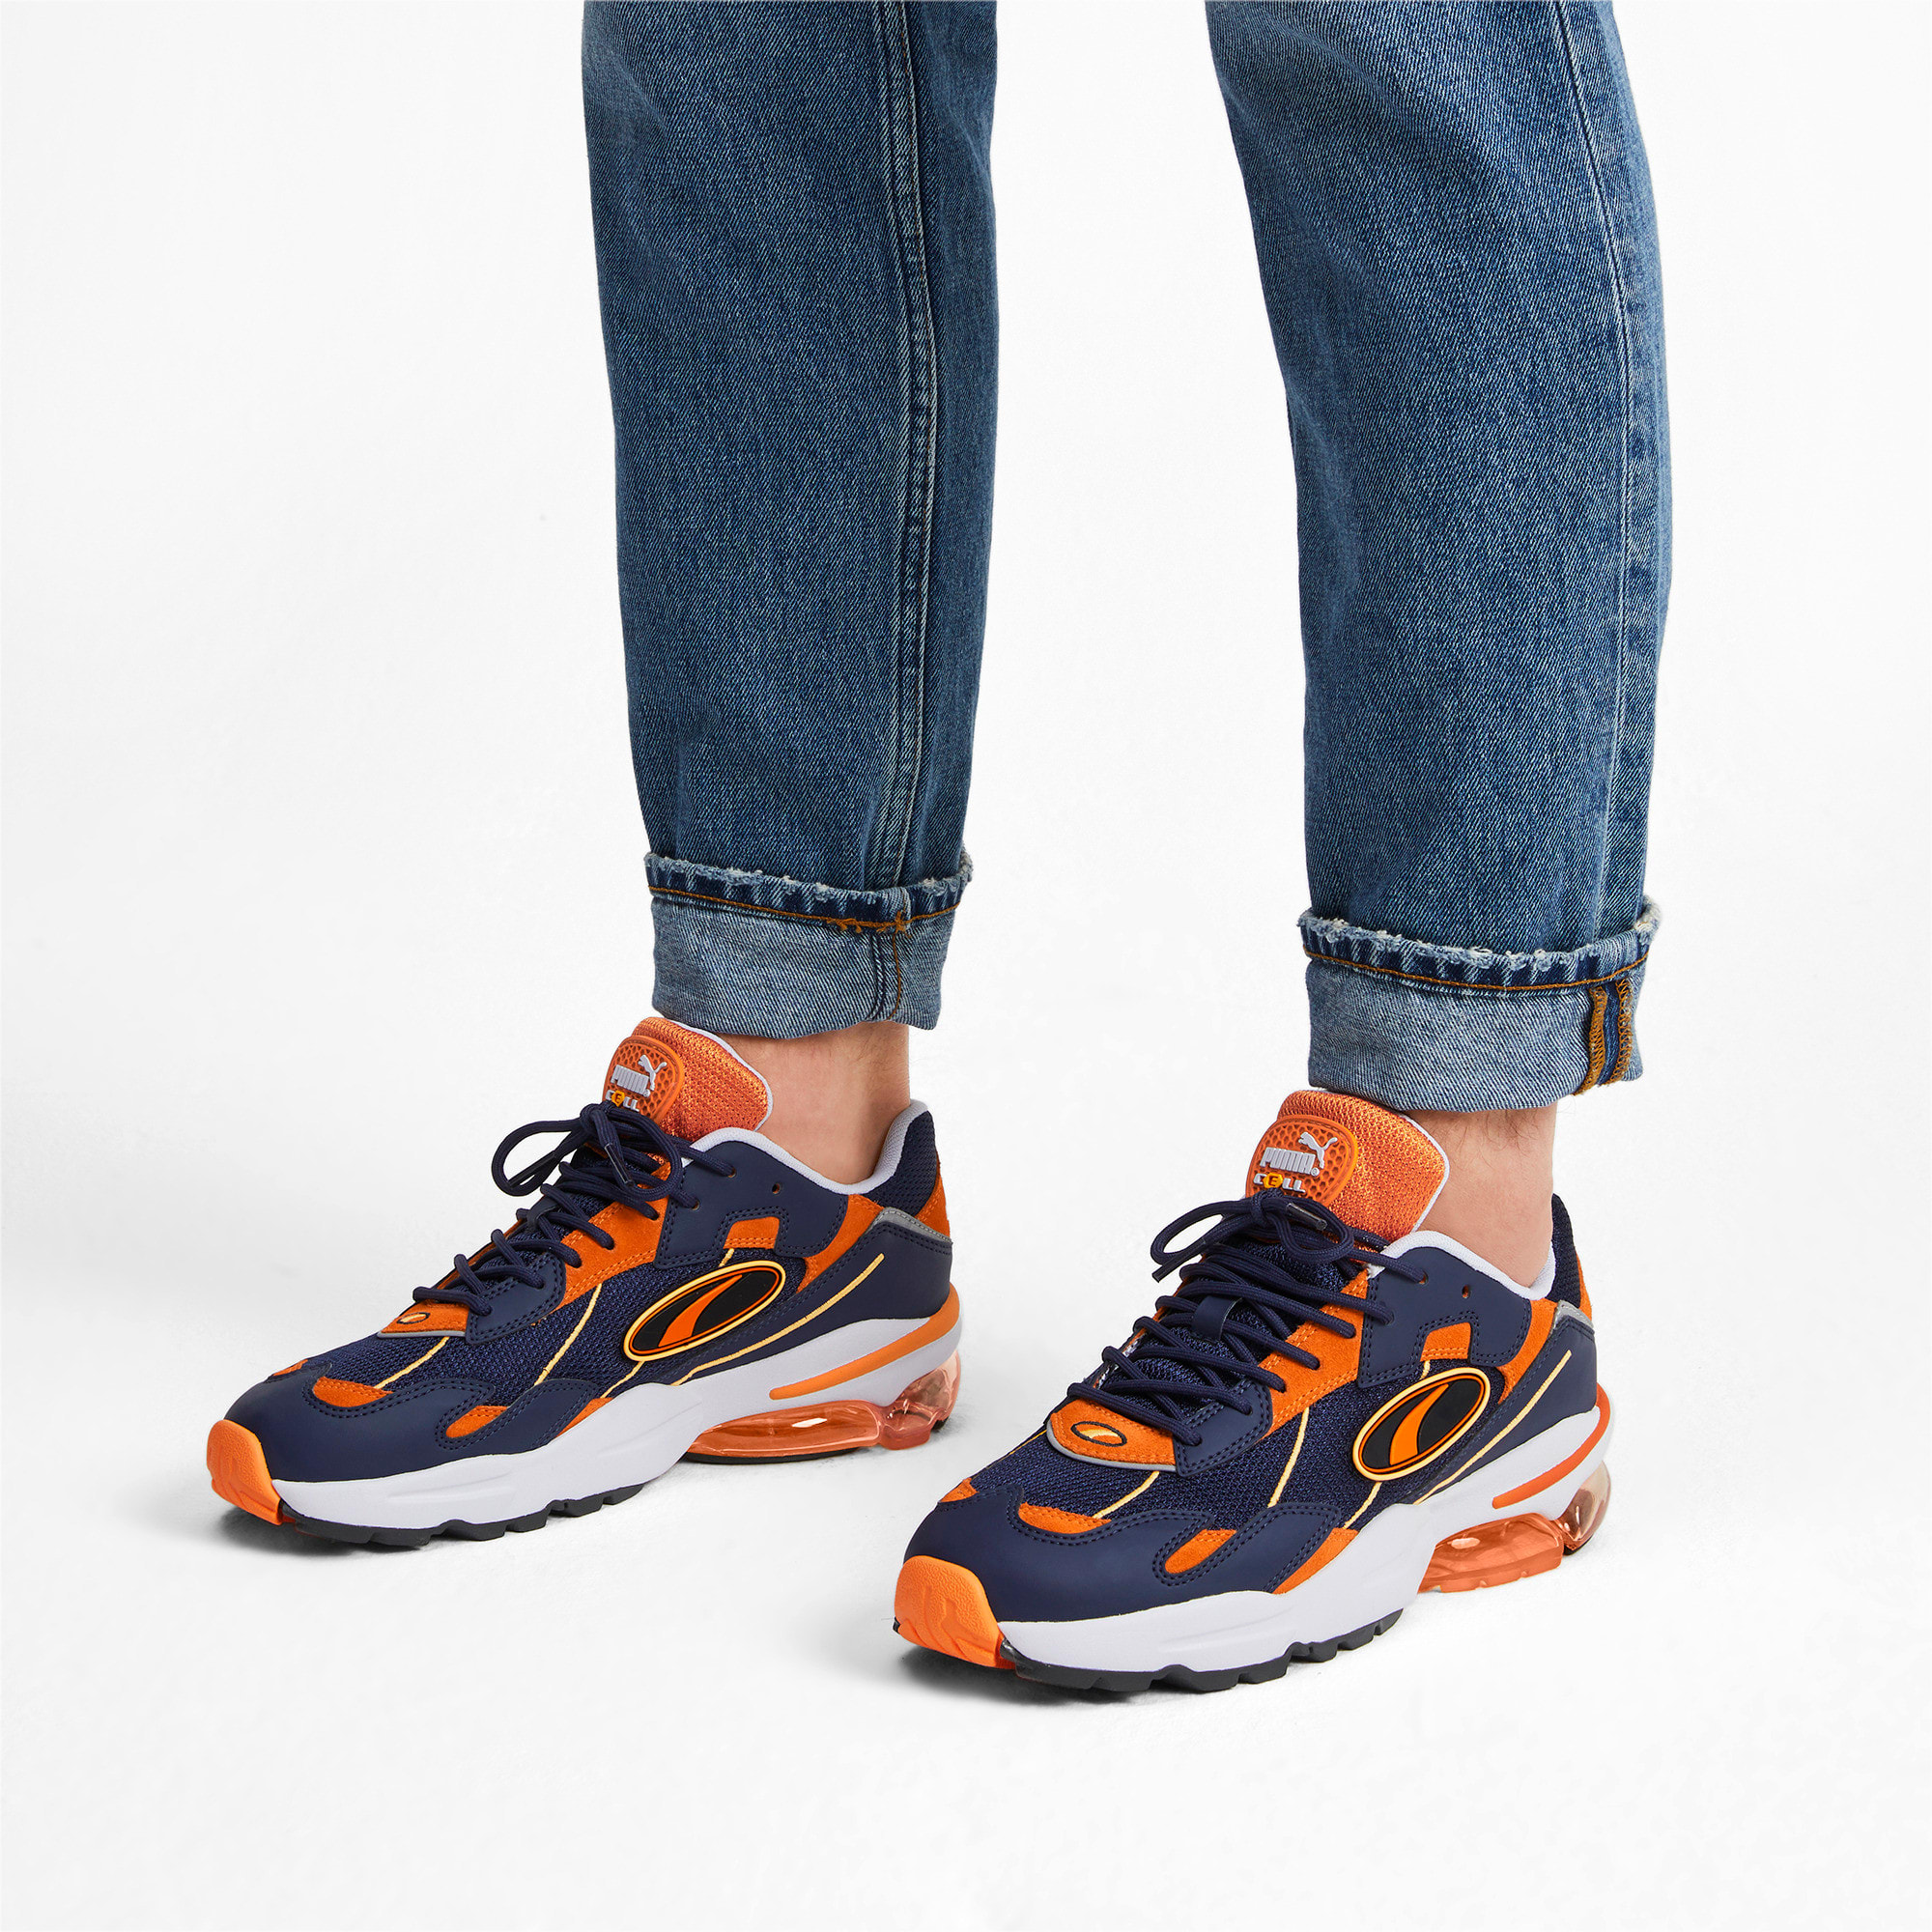 Thumbnail 2 of CELL Ultra OG Pack Sneakers, Peacoat-Jaffa Orange, medium